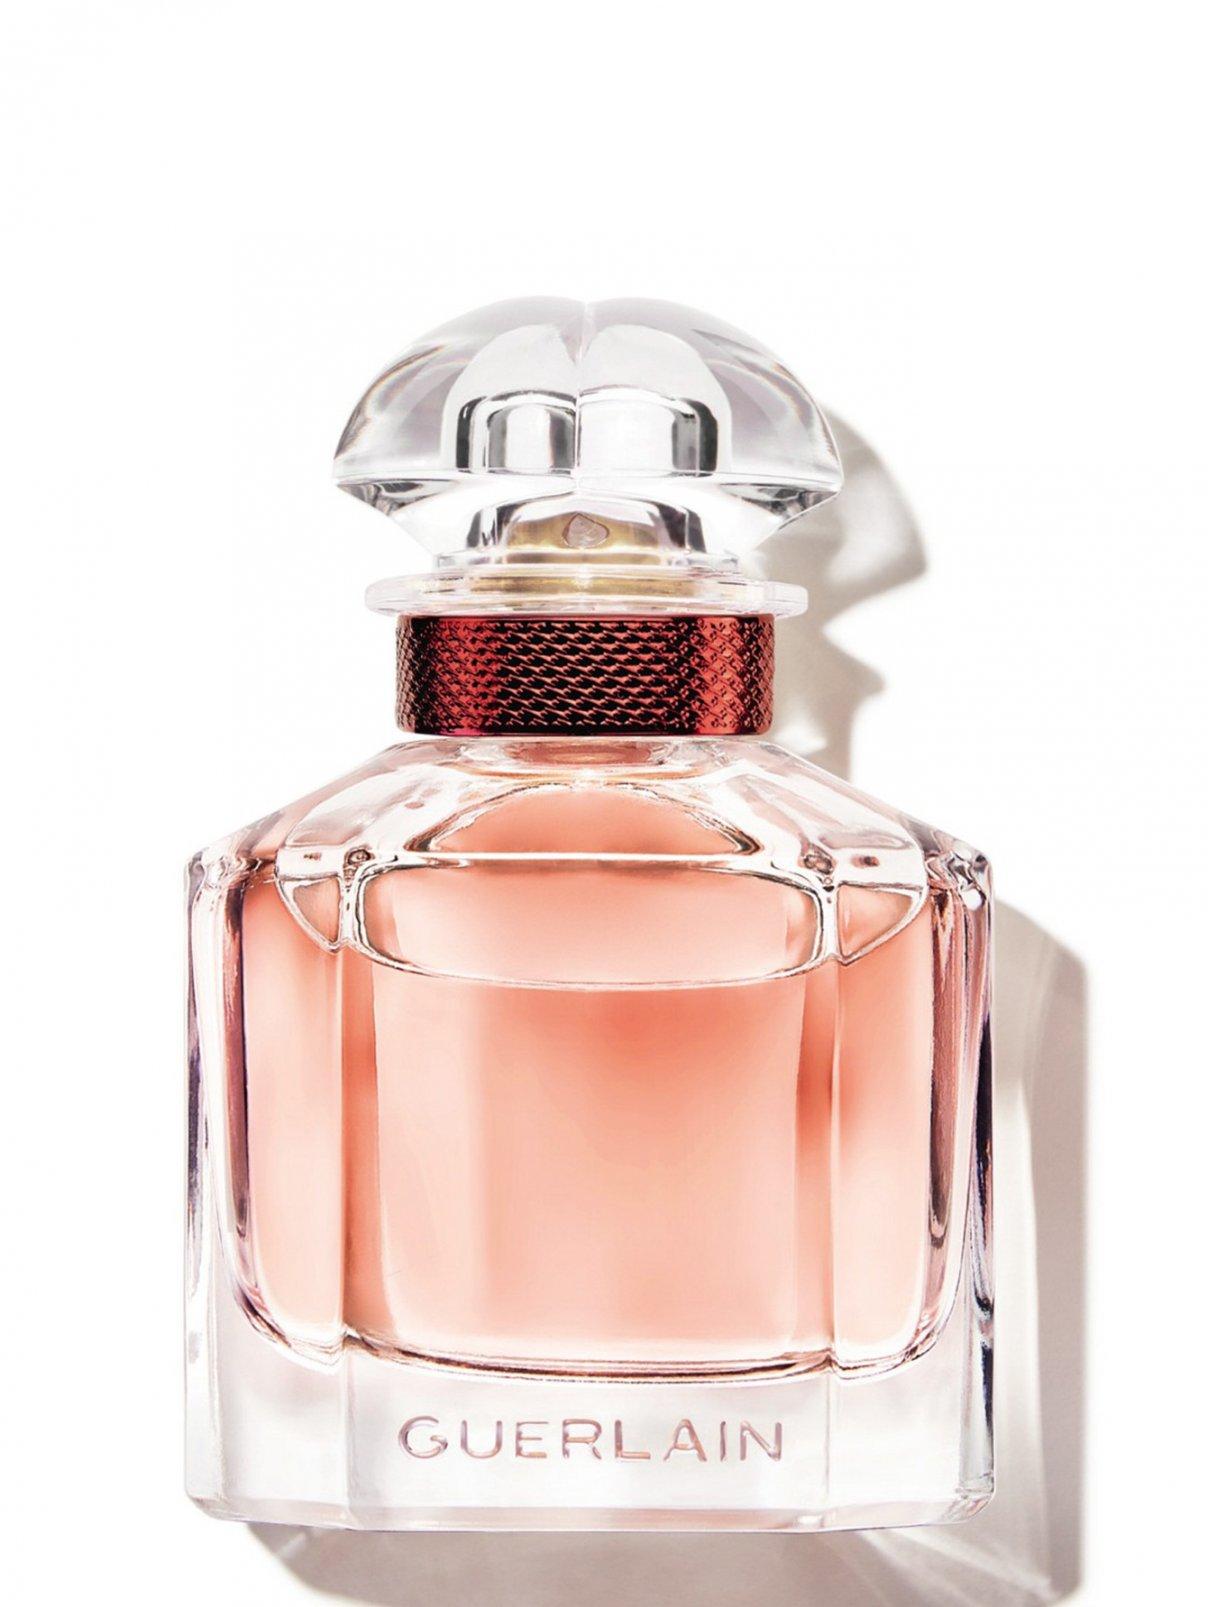 Парфюмерная вода Mon Guerlain Bloom of Rose, 50 мл Guerlain  –  Общий вид